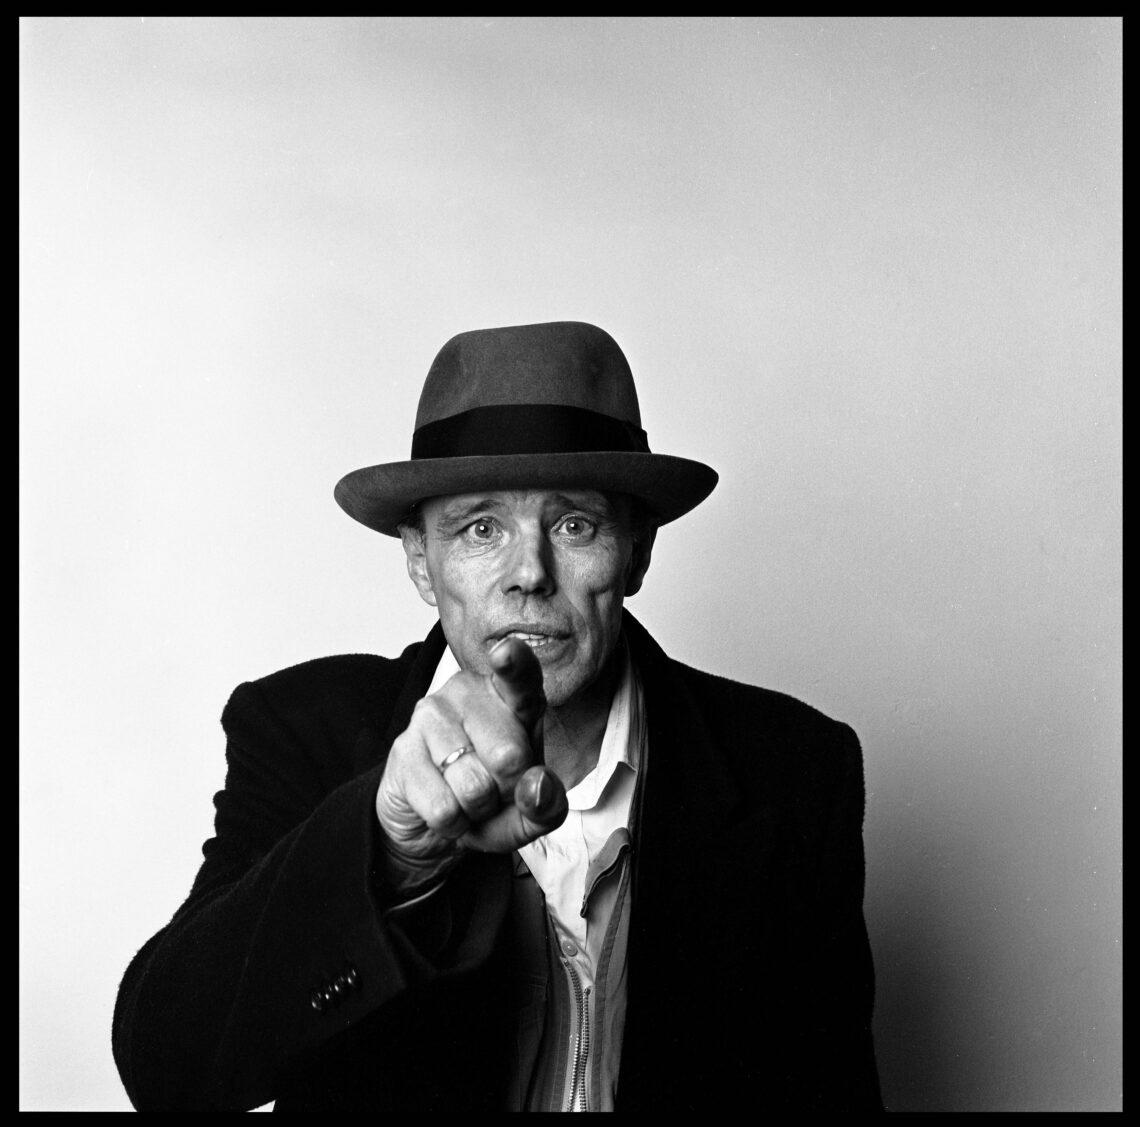 © Imago, Laurence Sudre, Joseph Beuys, 1985